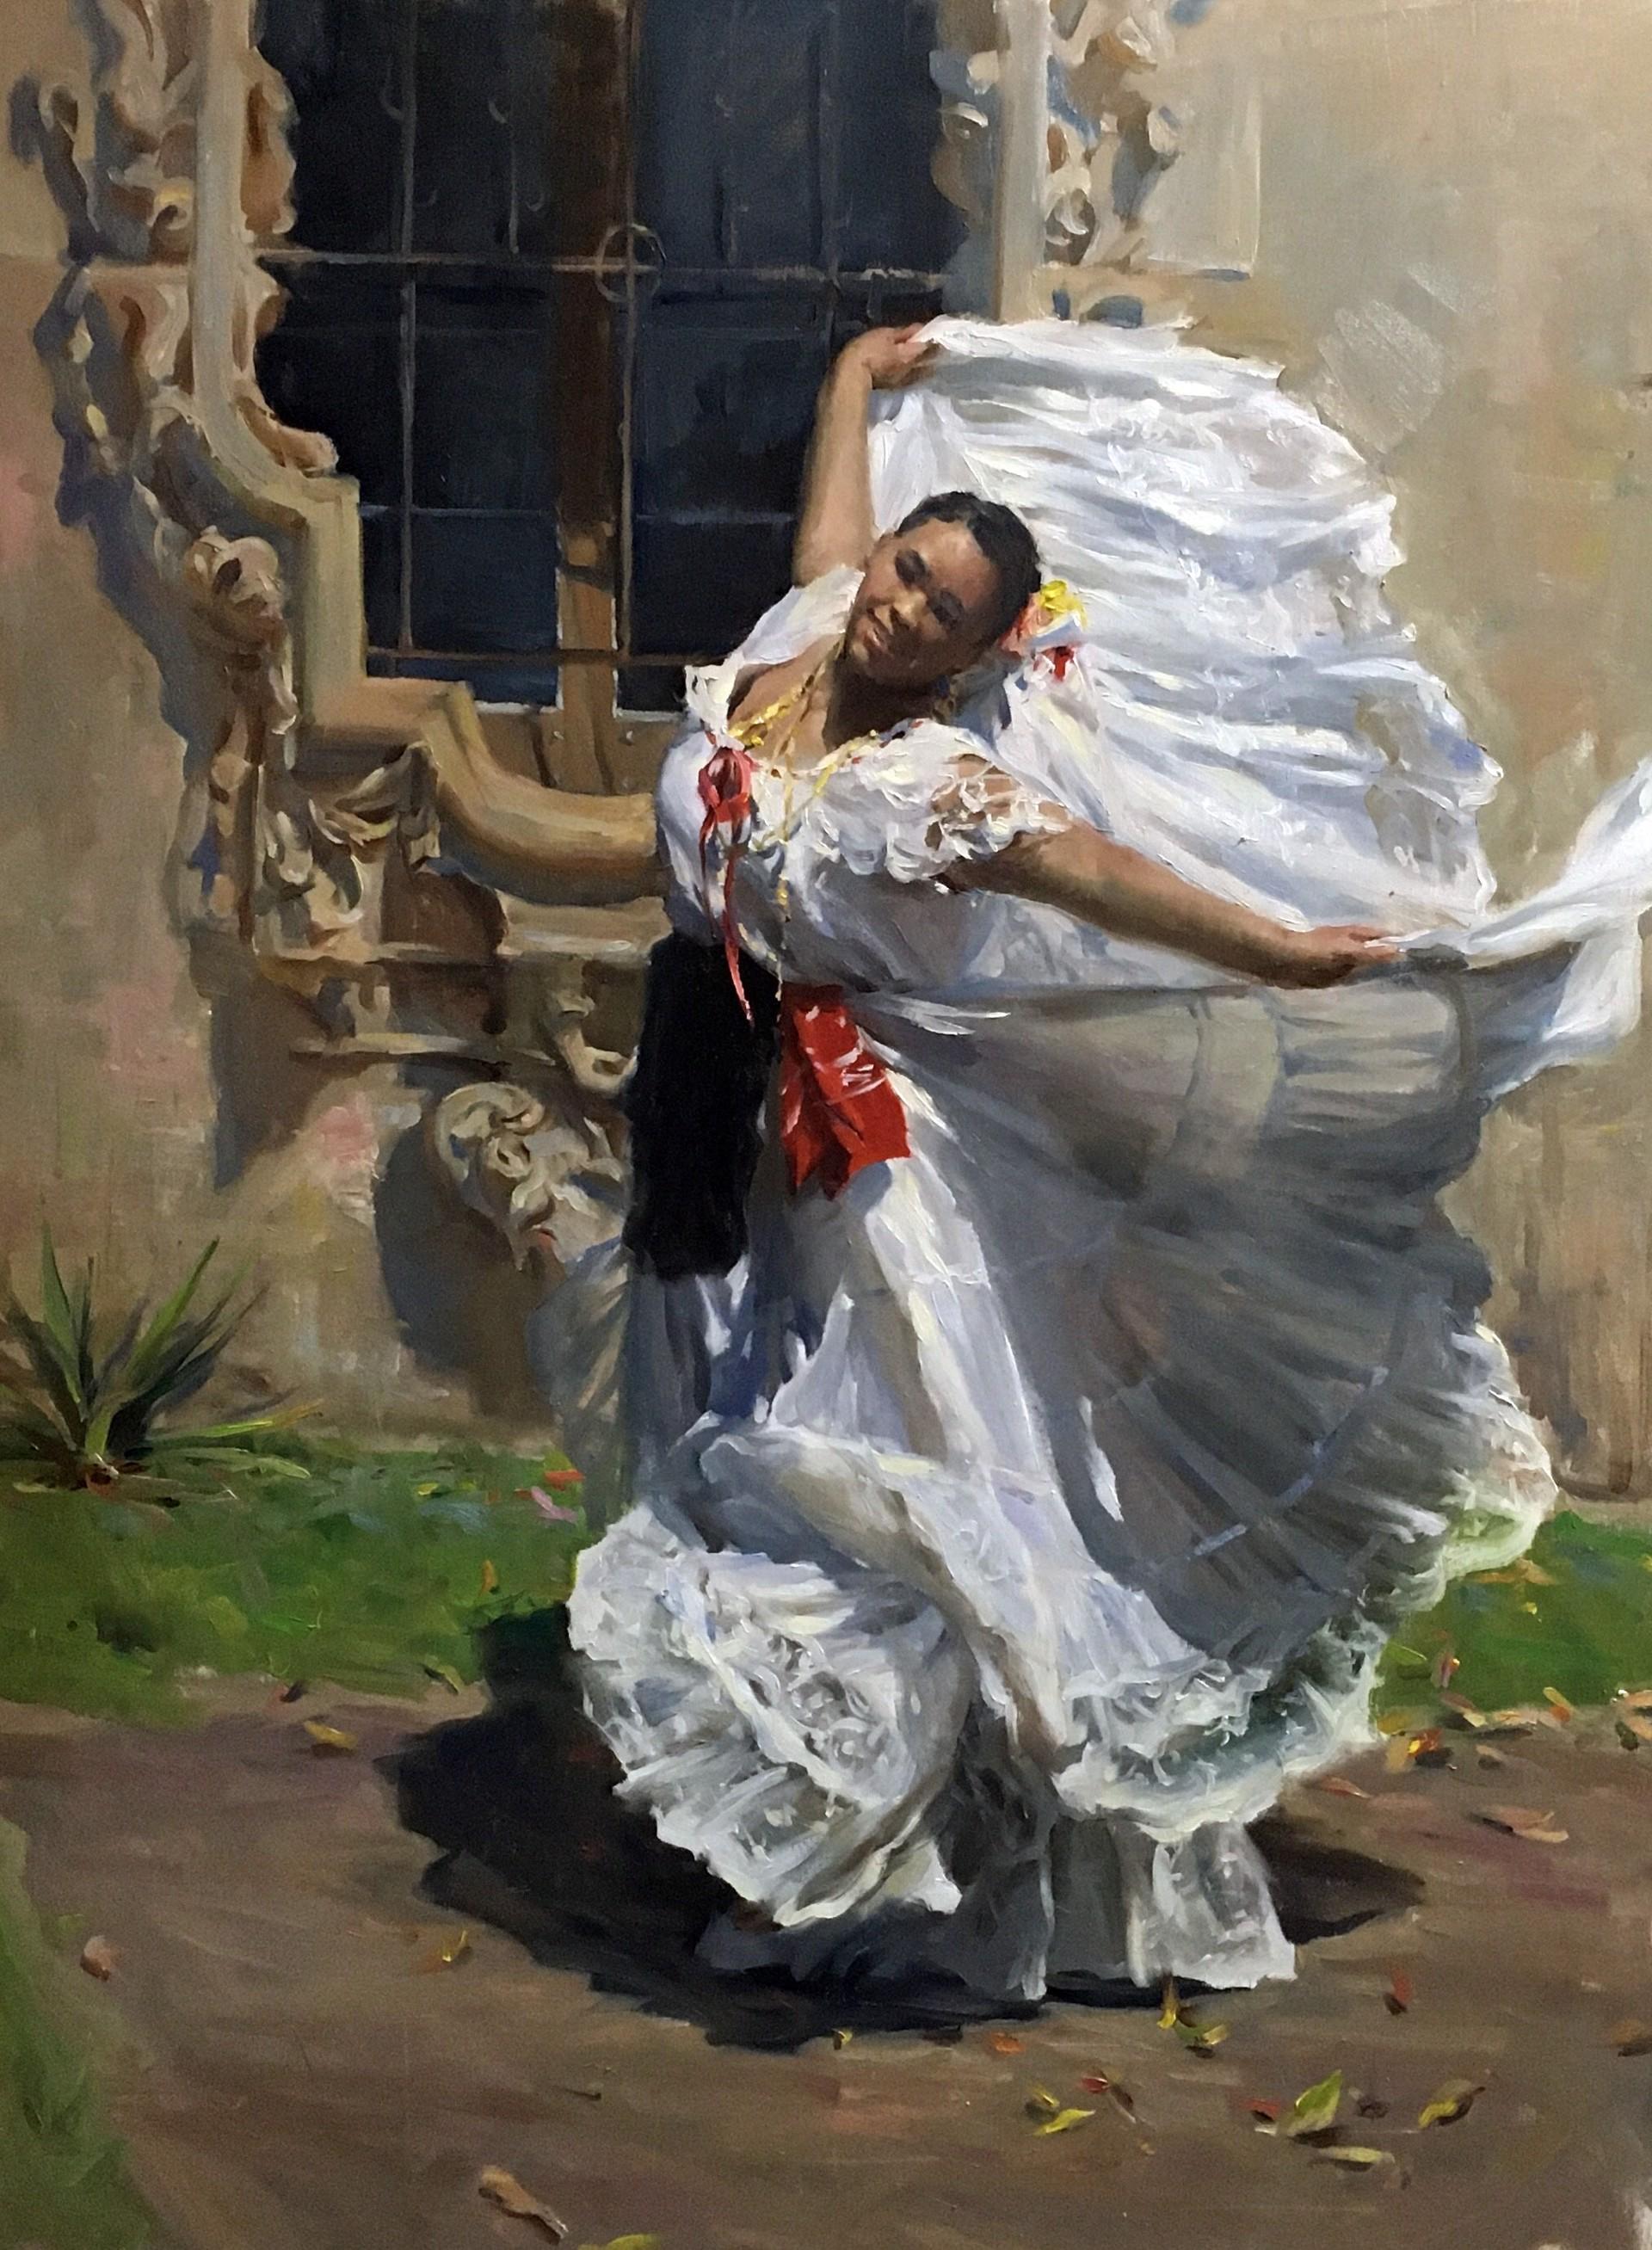 Son Jarocho Dancer by Kyle Ma